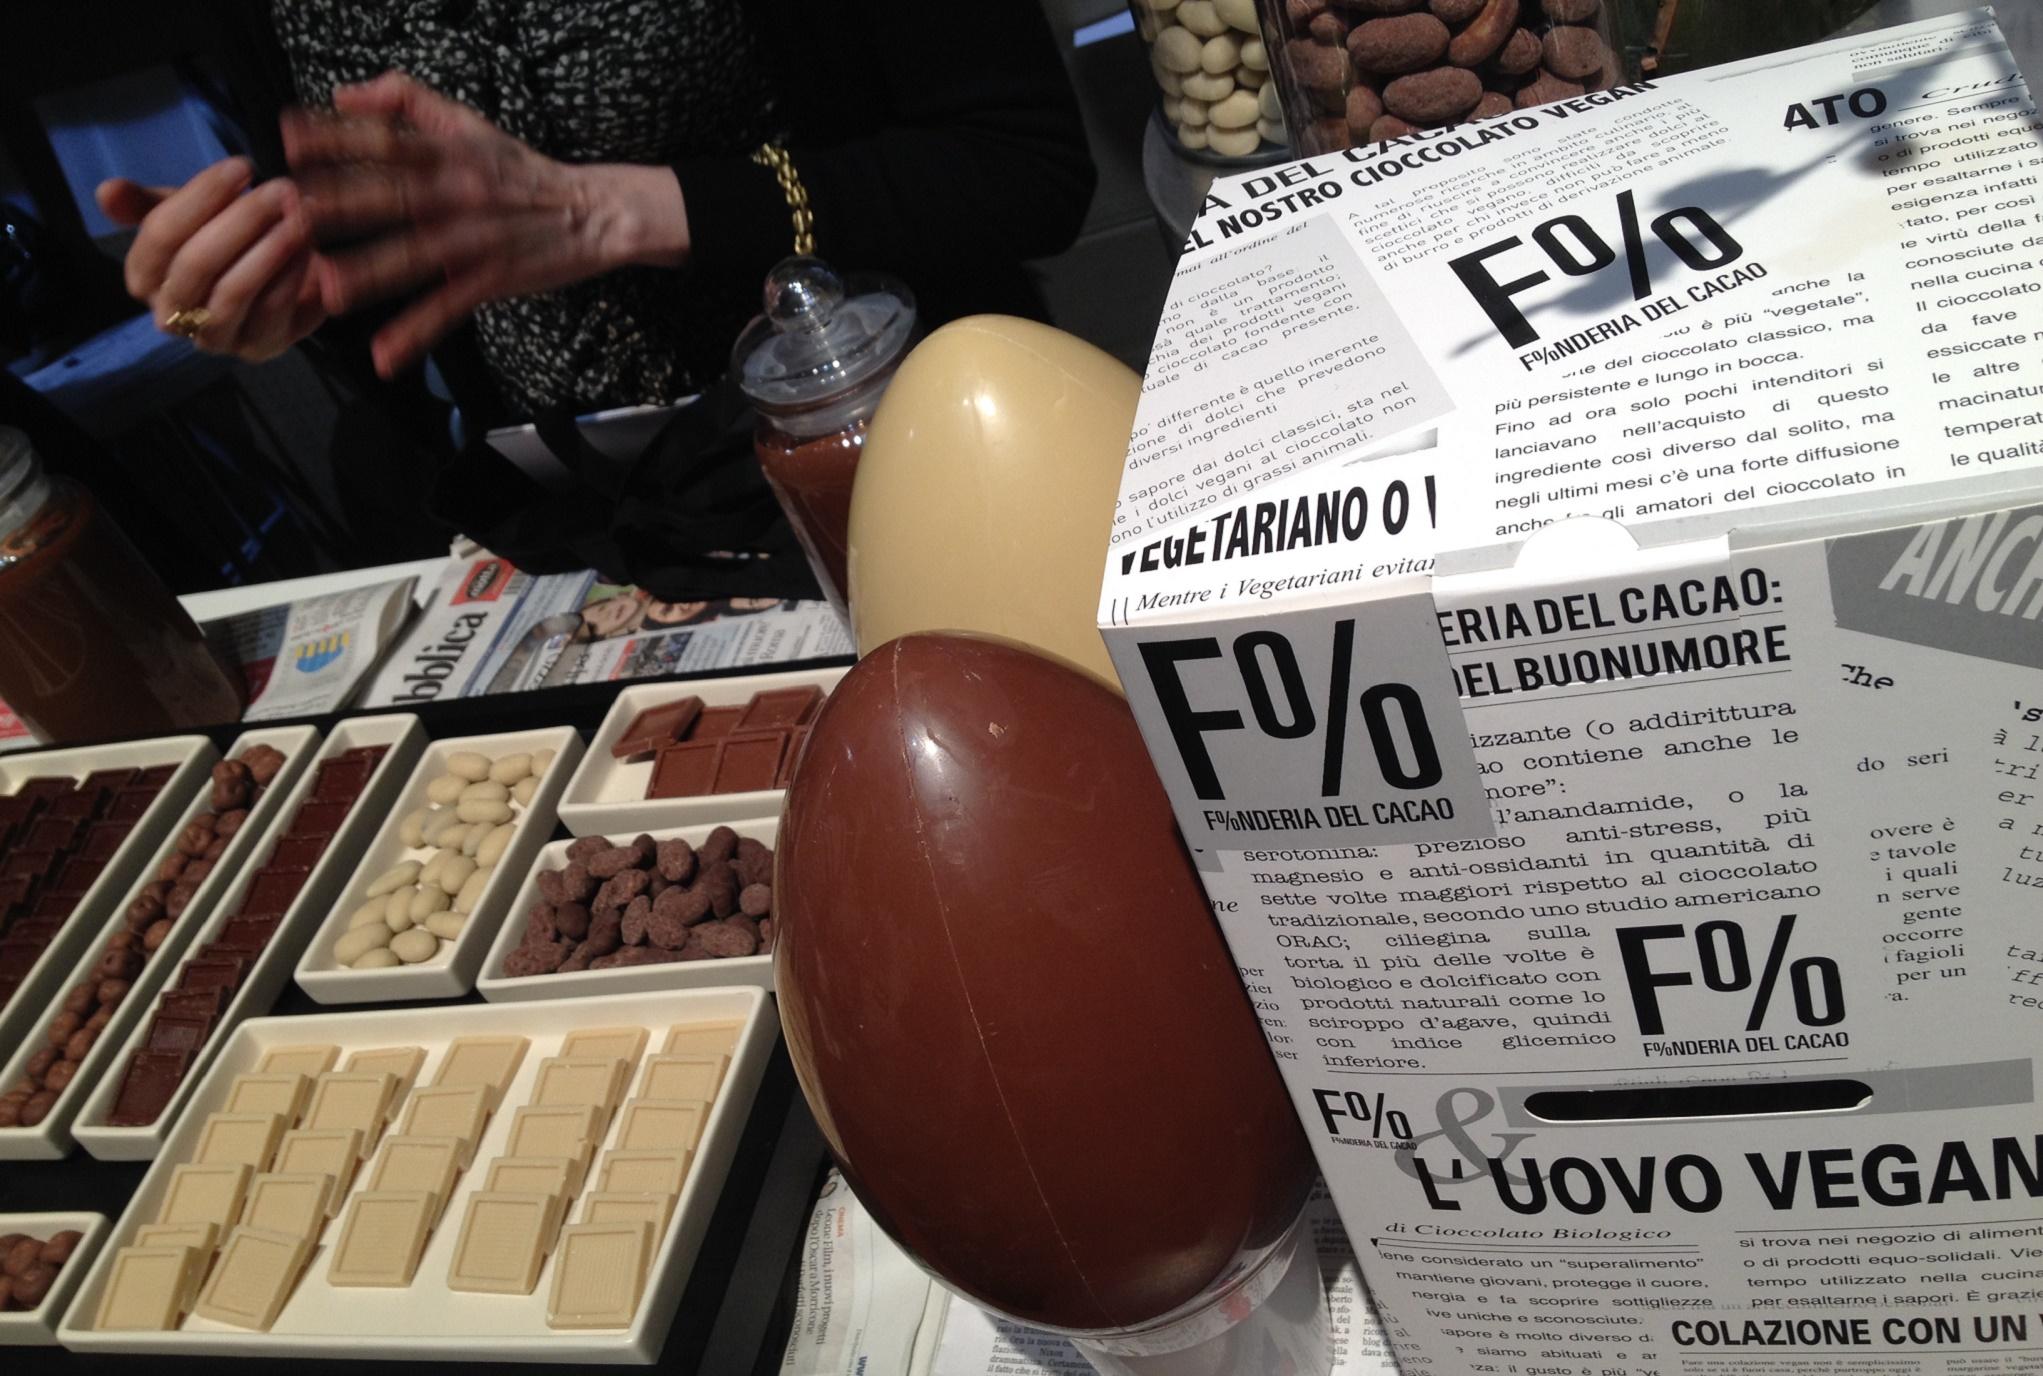 uovo pasqua vegano Fonderia del cacao taste 2016